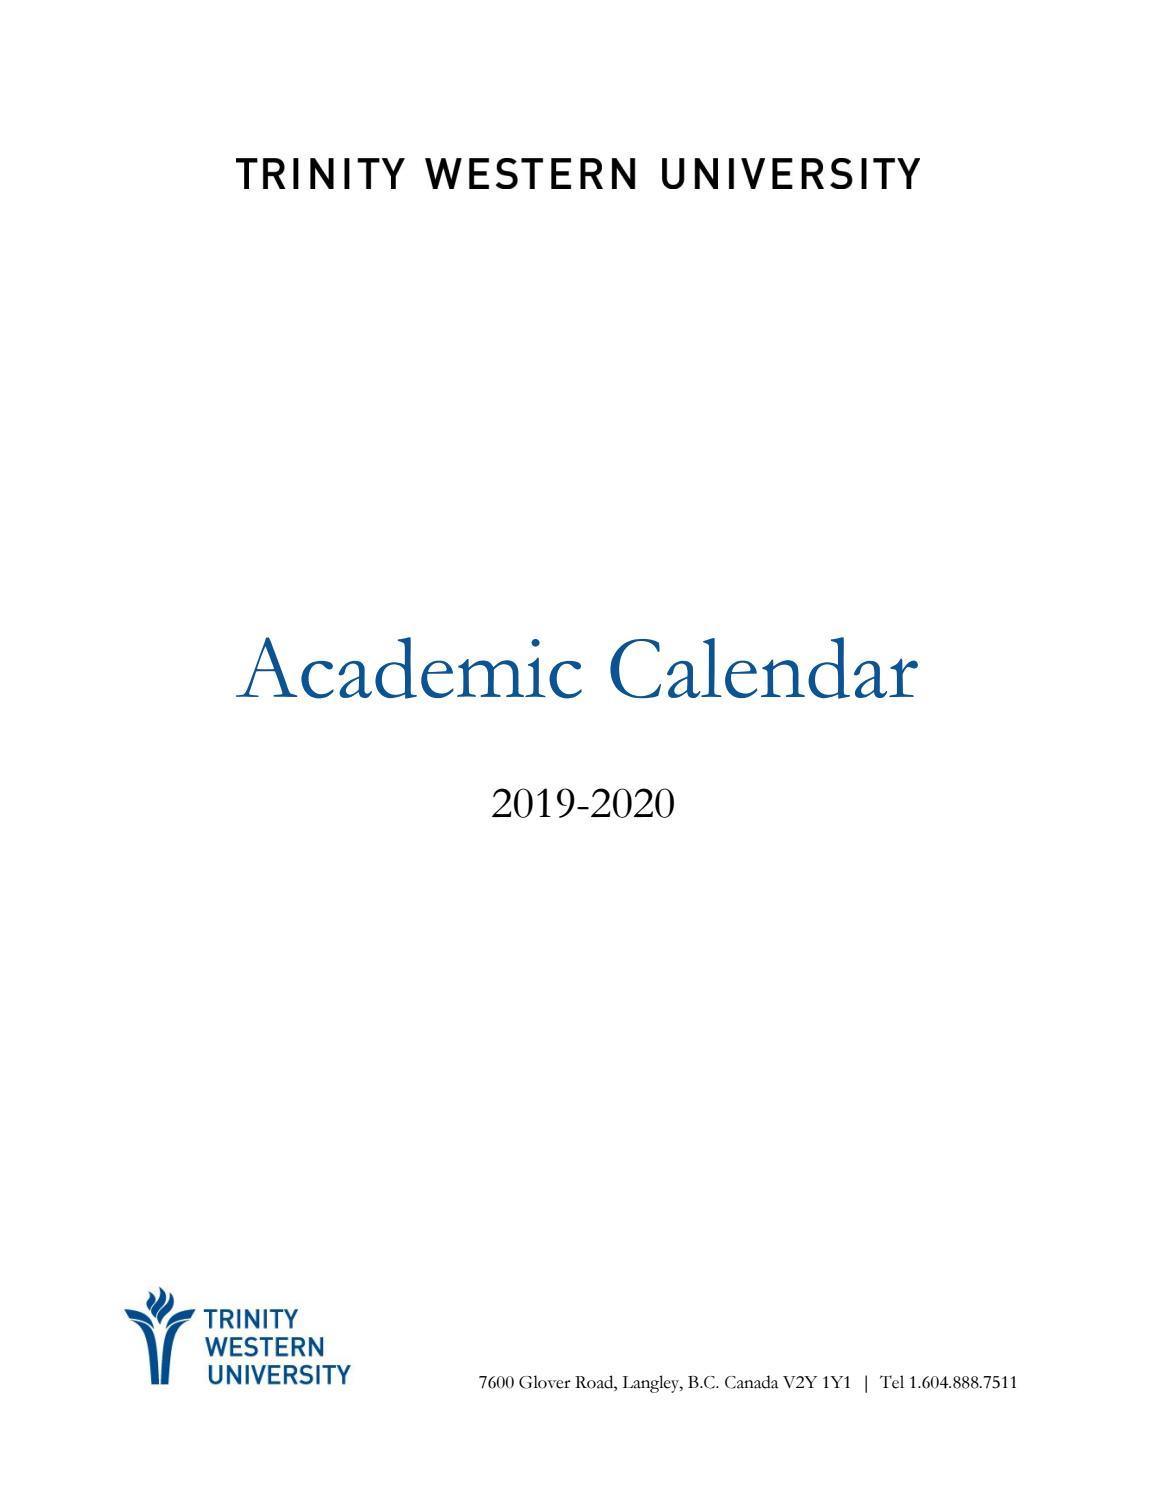 2019 20 Academic Calendartwu - Issuu Pertaining To The College Of Saint Rose Academic Calendar